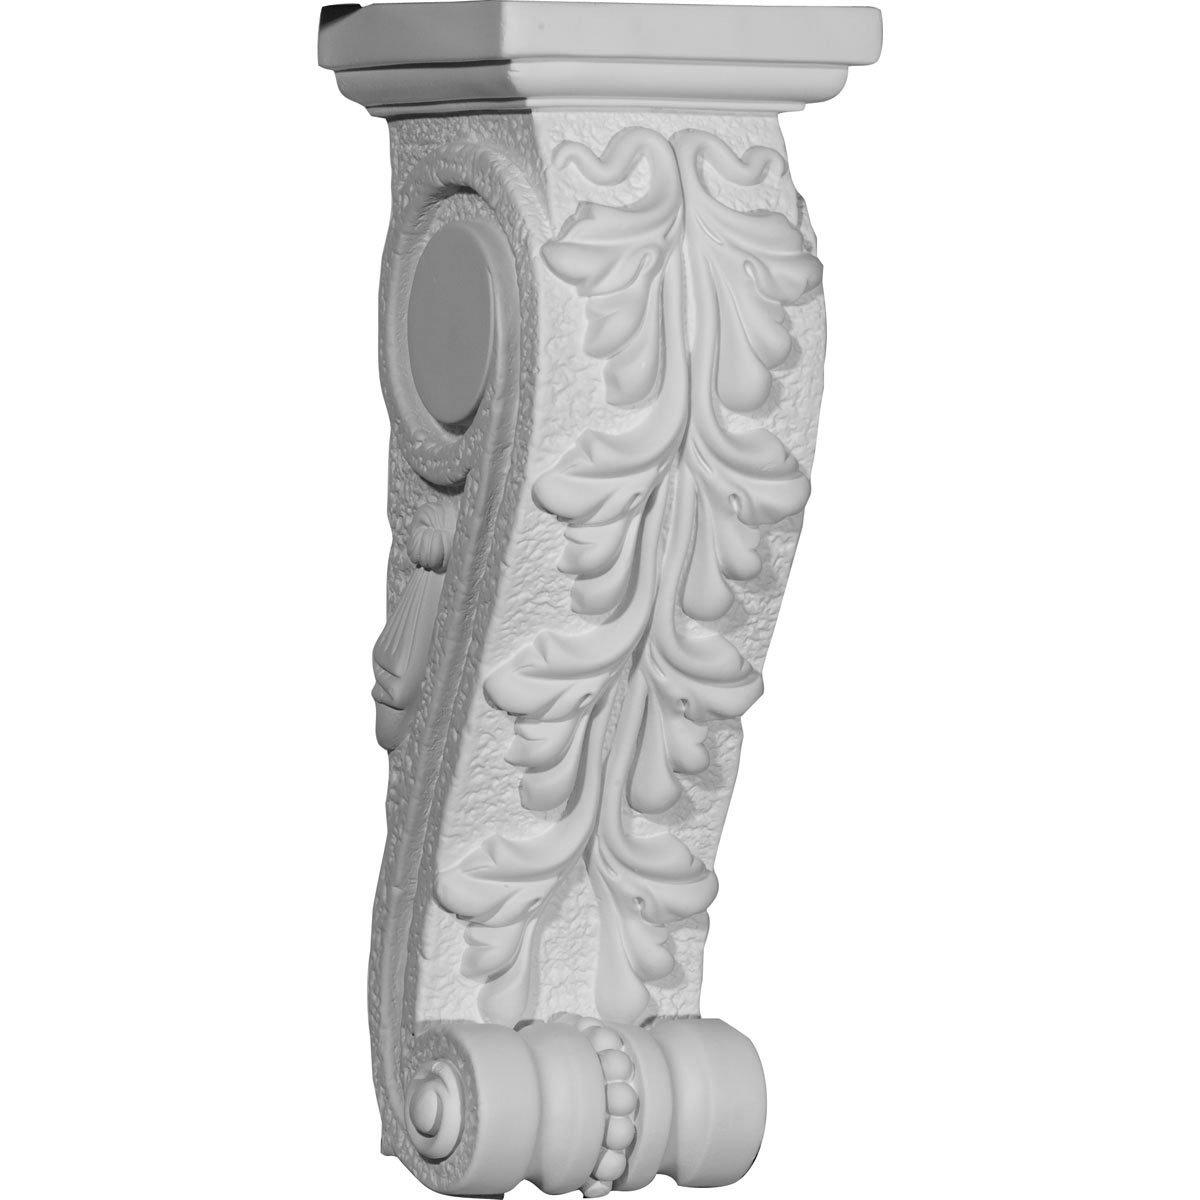 Ekena Millwork COR04X04X12NE-CASE-2 4 1//4 inch W x 4 3//8 inch D x 12 3//4 inch H Needham Corbel , 2-Pack